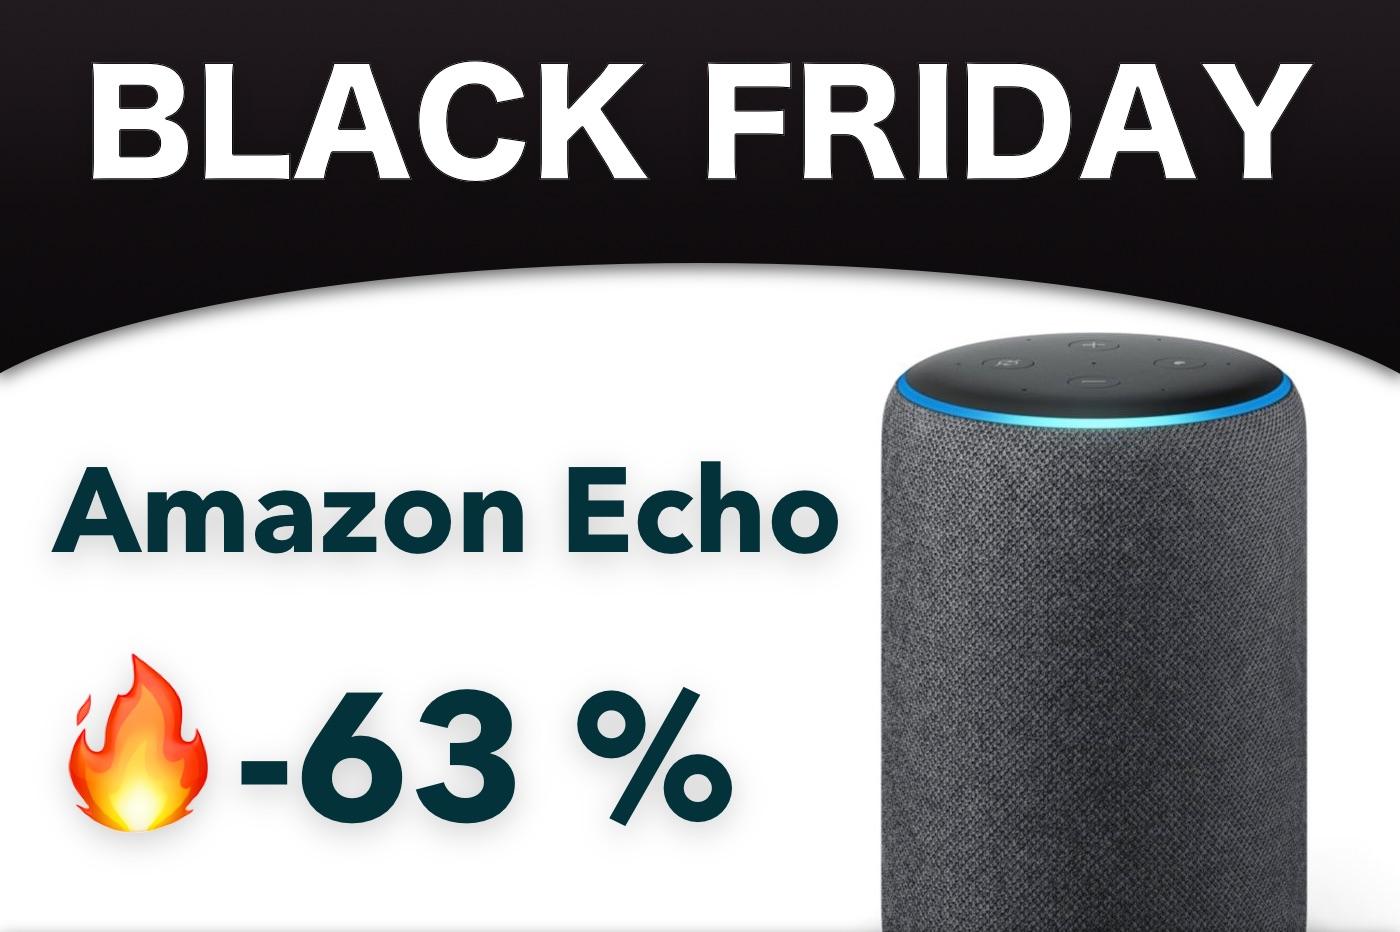 Black Friday Amazon Echo